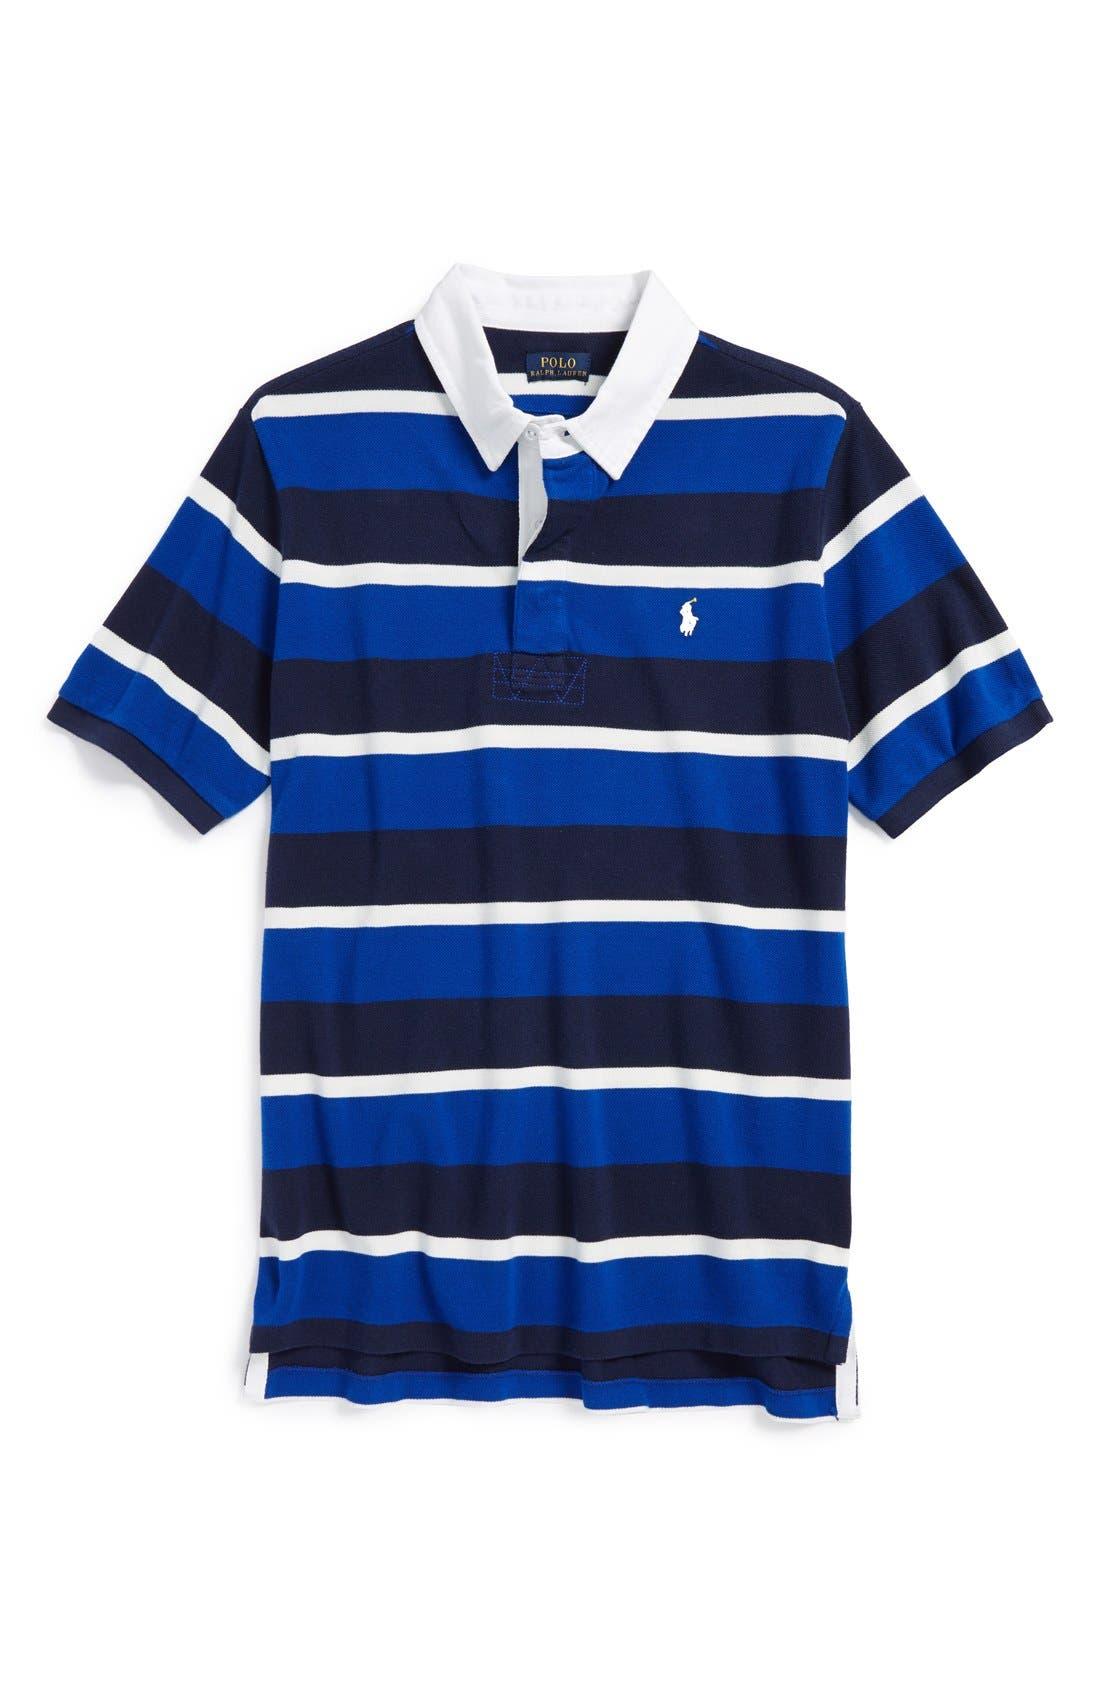 Alternate Image 1 Selected - Ralph Lauren Rugby Stripe Mesh Polo (Toddler Boys)